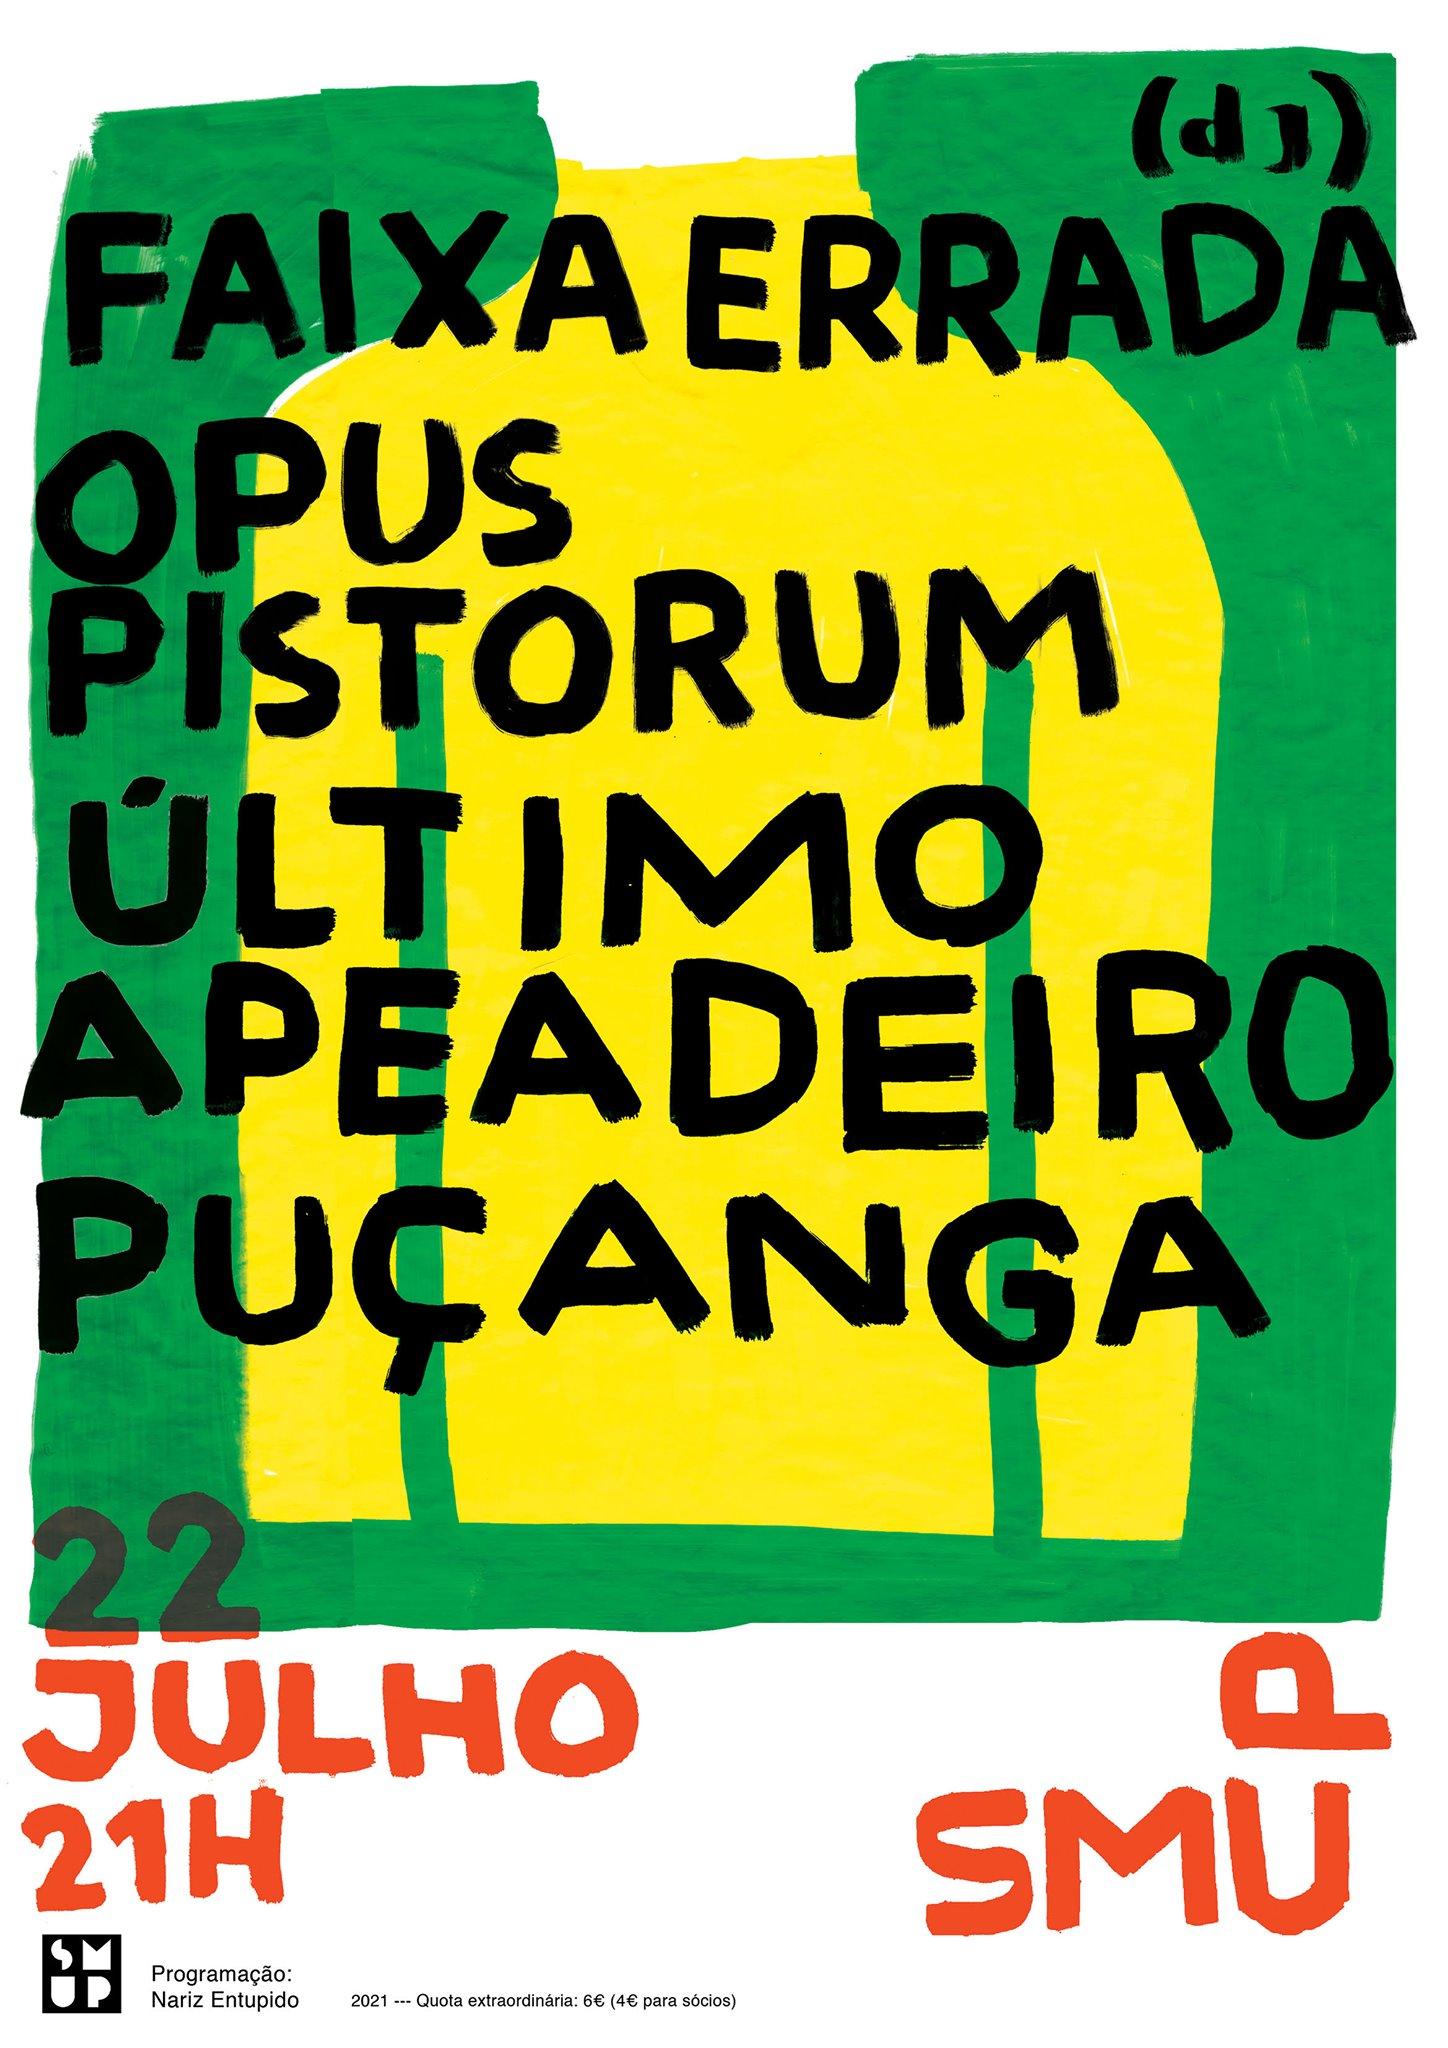 Puçanga   Opus Pistorum   Último  Apeadeiro   Faixa Errada (dj)